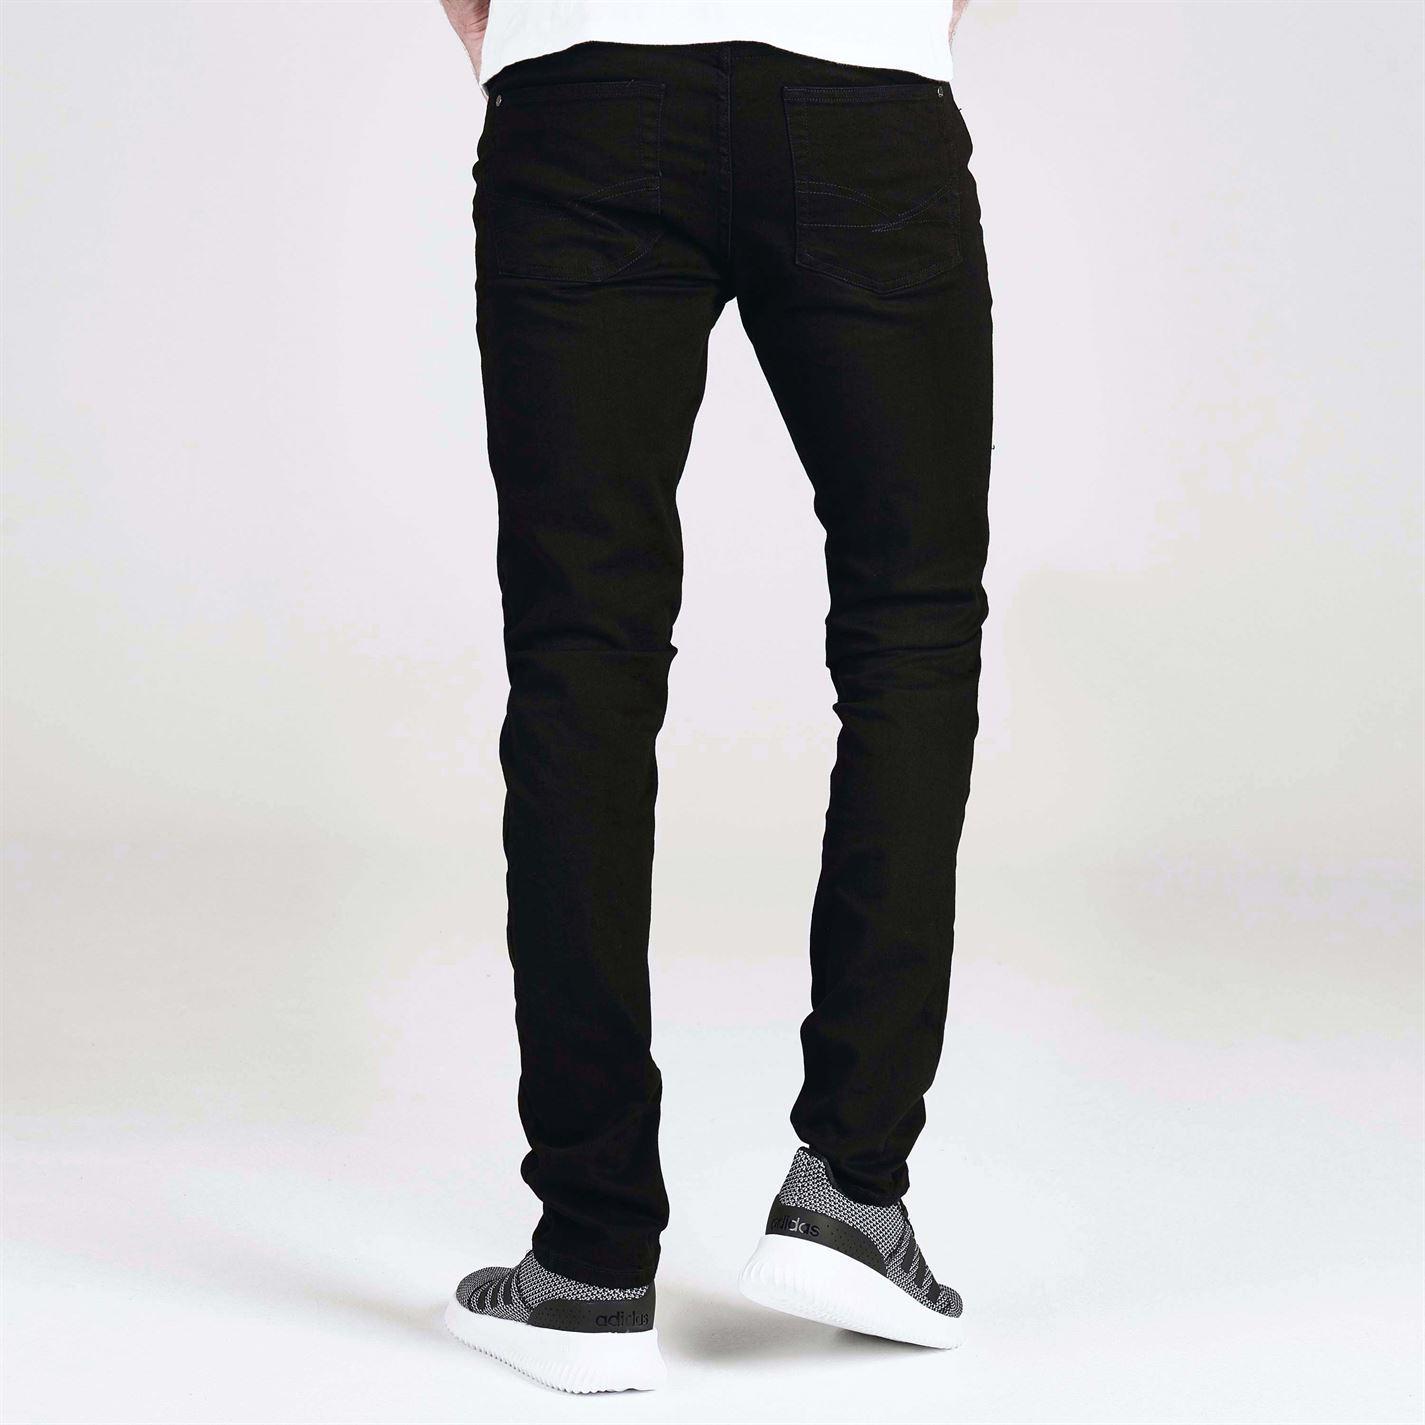 Jeans-Denim-Firetrap-Skinny-Mens-Trouser-Black thumbnail 12